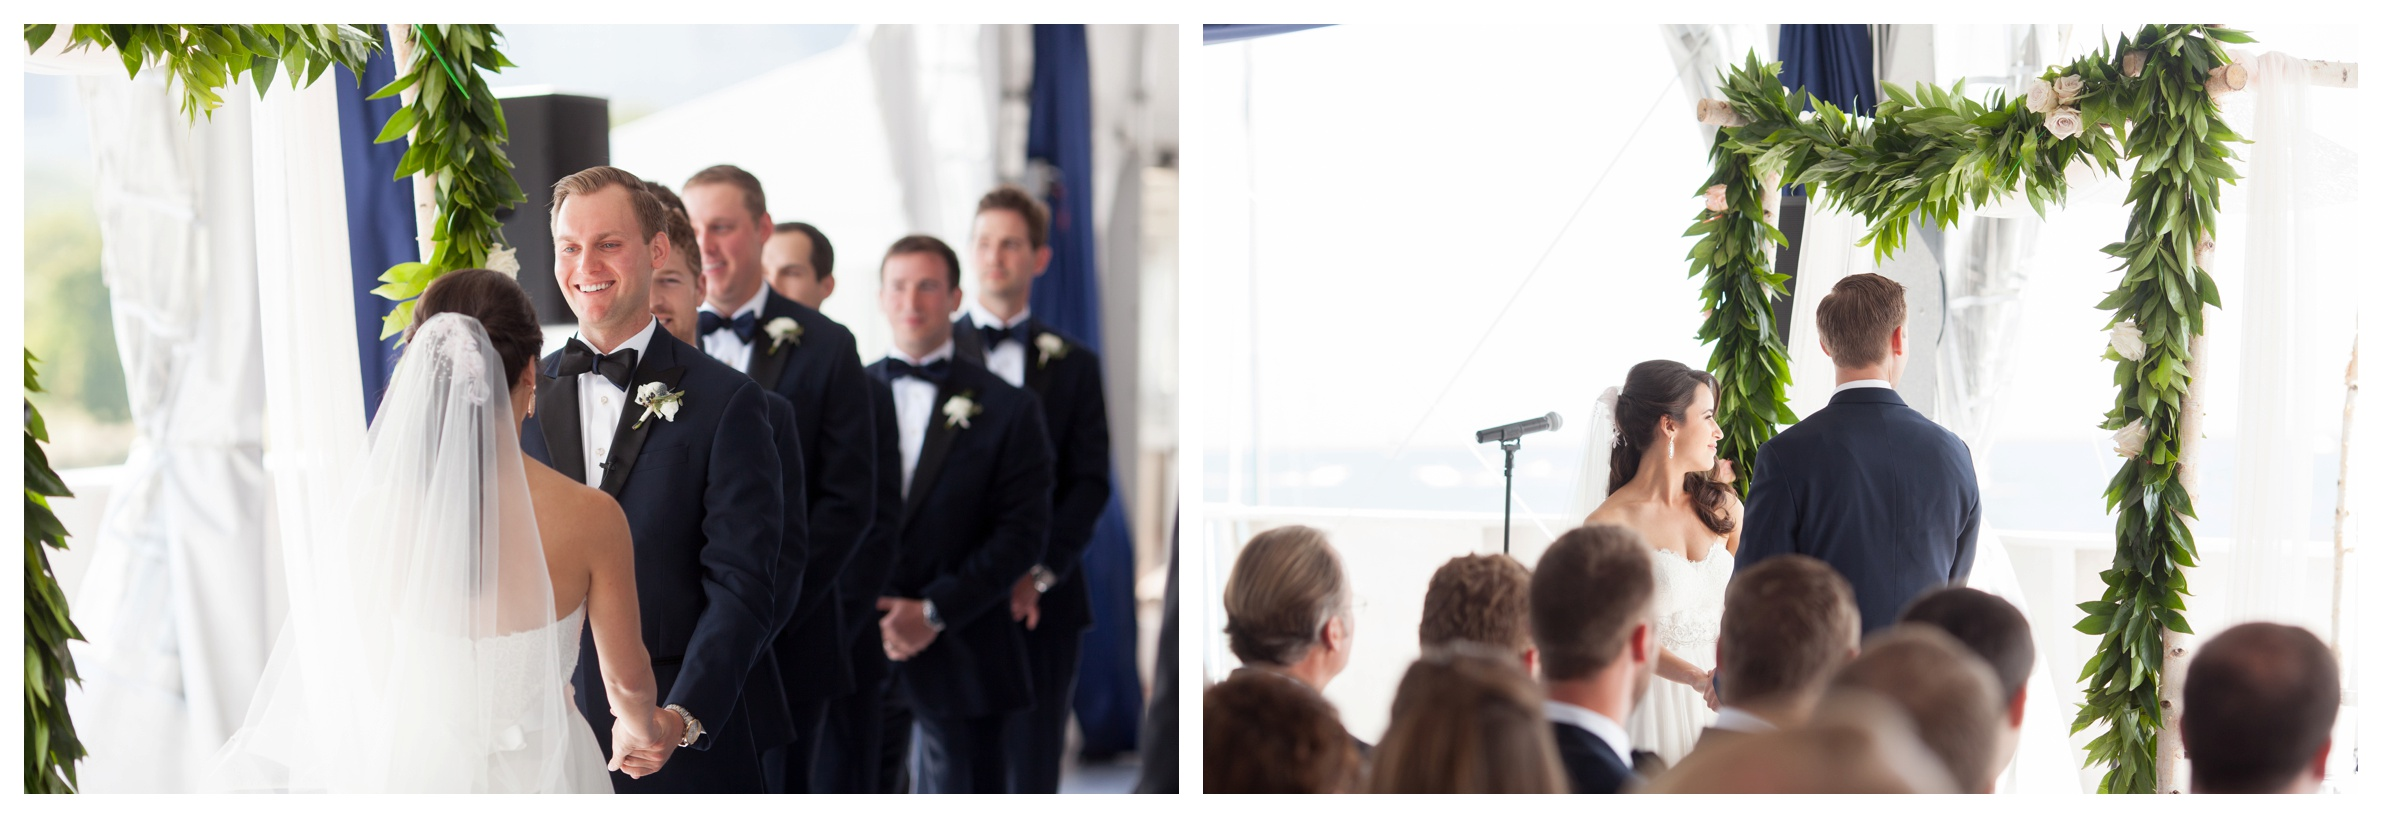 columbia-yacht-club-chicago-wedding_0019.jpg